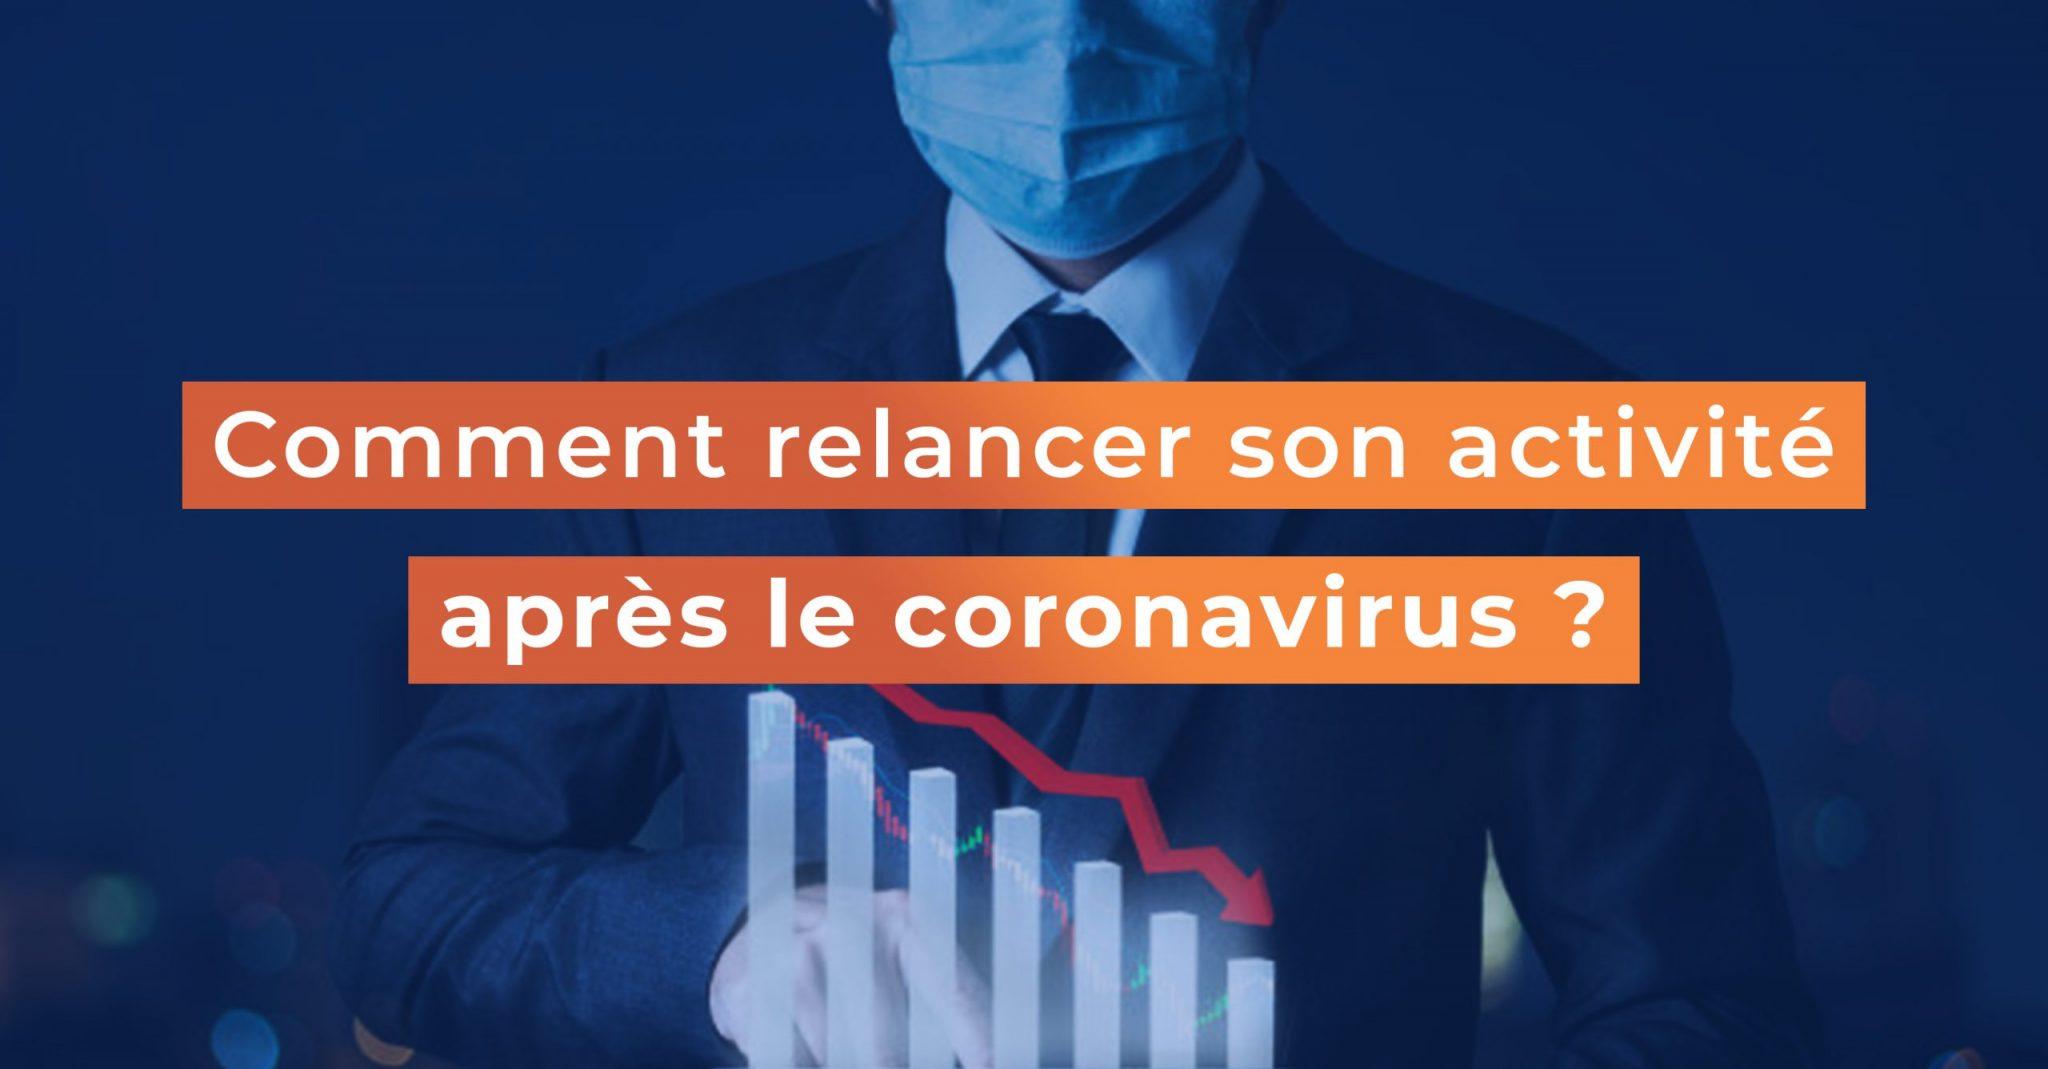 2007 Relancer Son Business Face Au Coronavirus